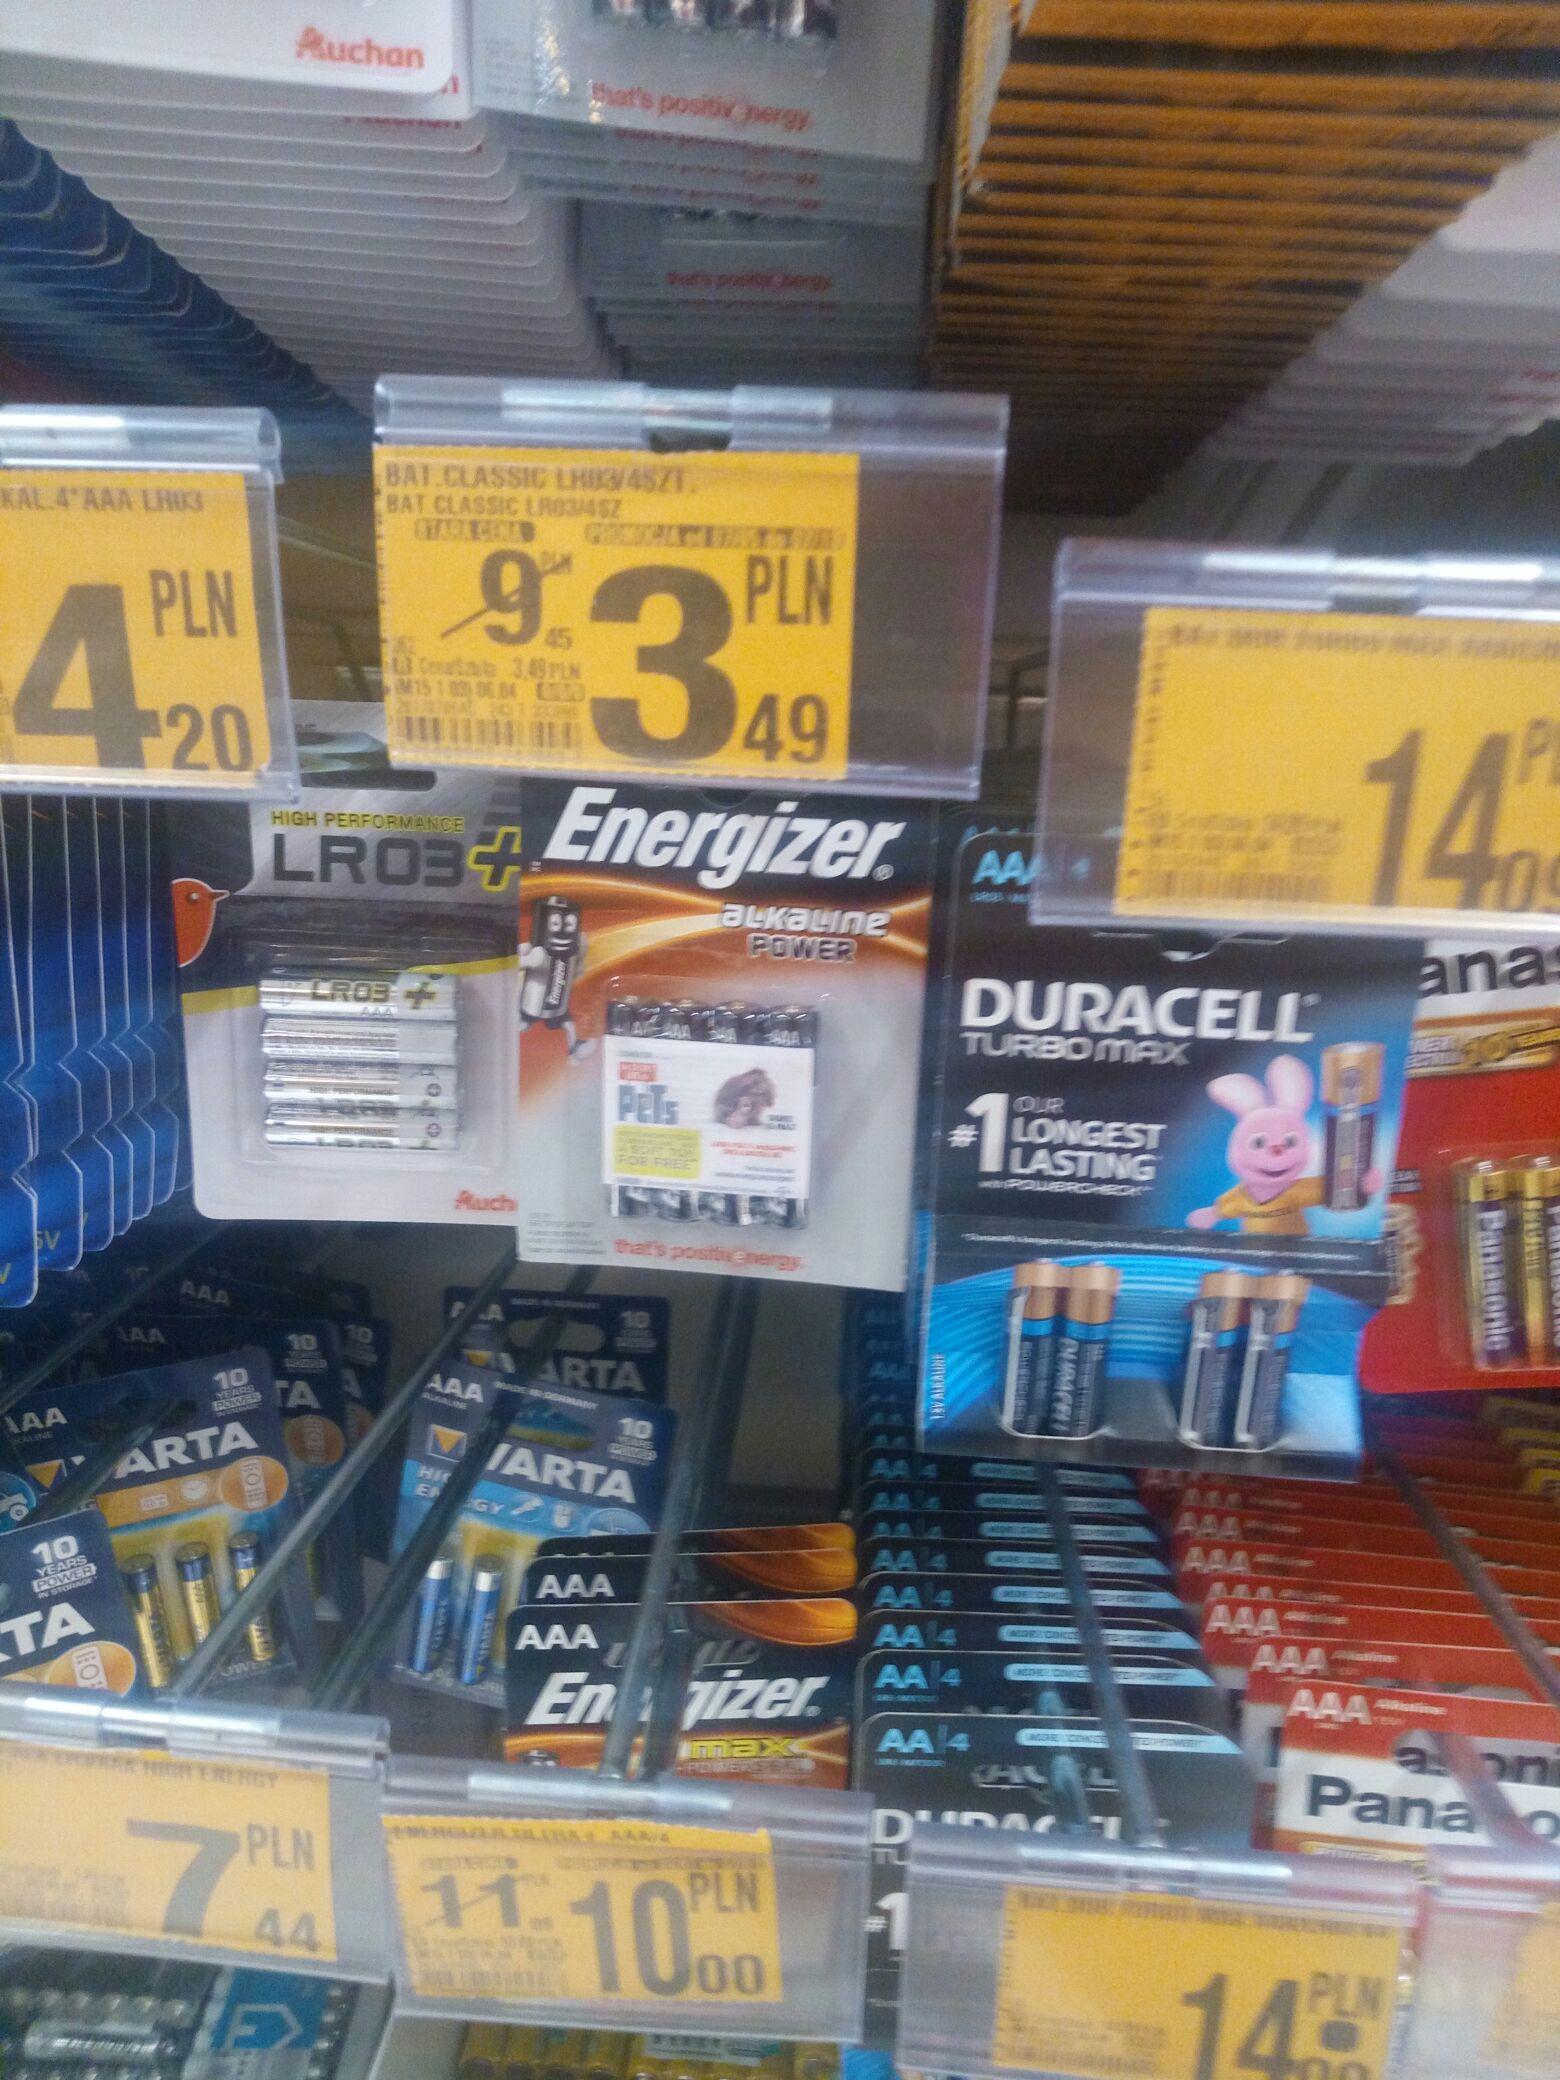 Baterie Energizer alkaline power AA oraz AAA @Auchan